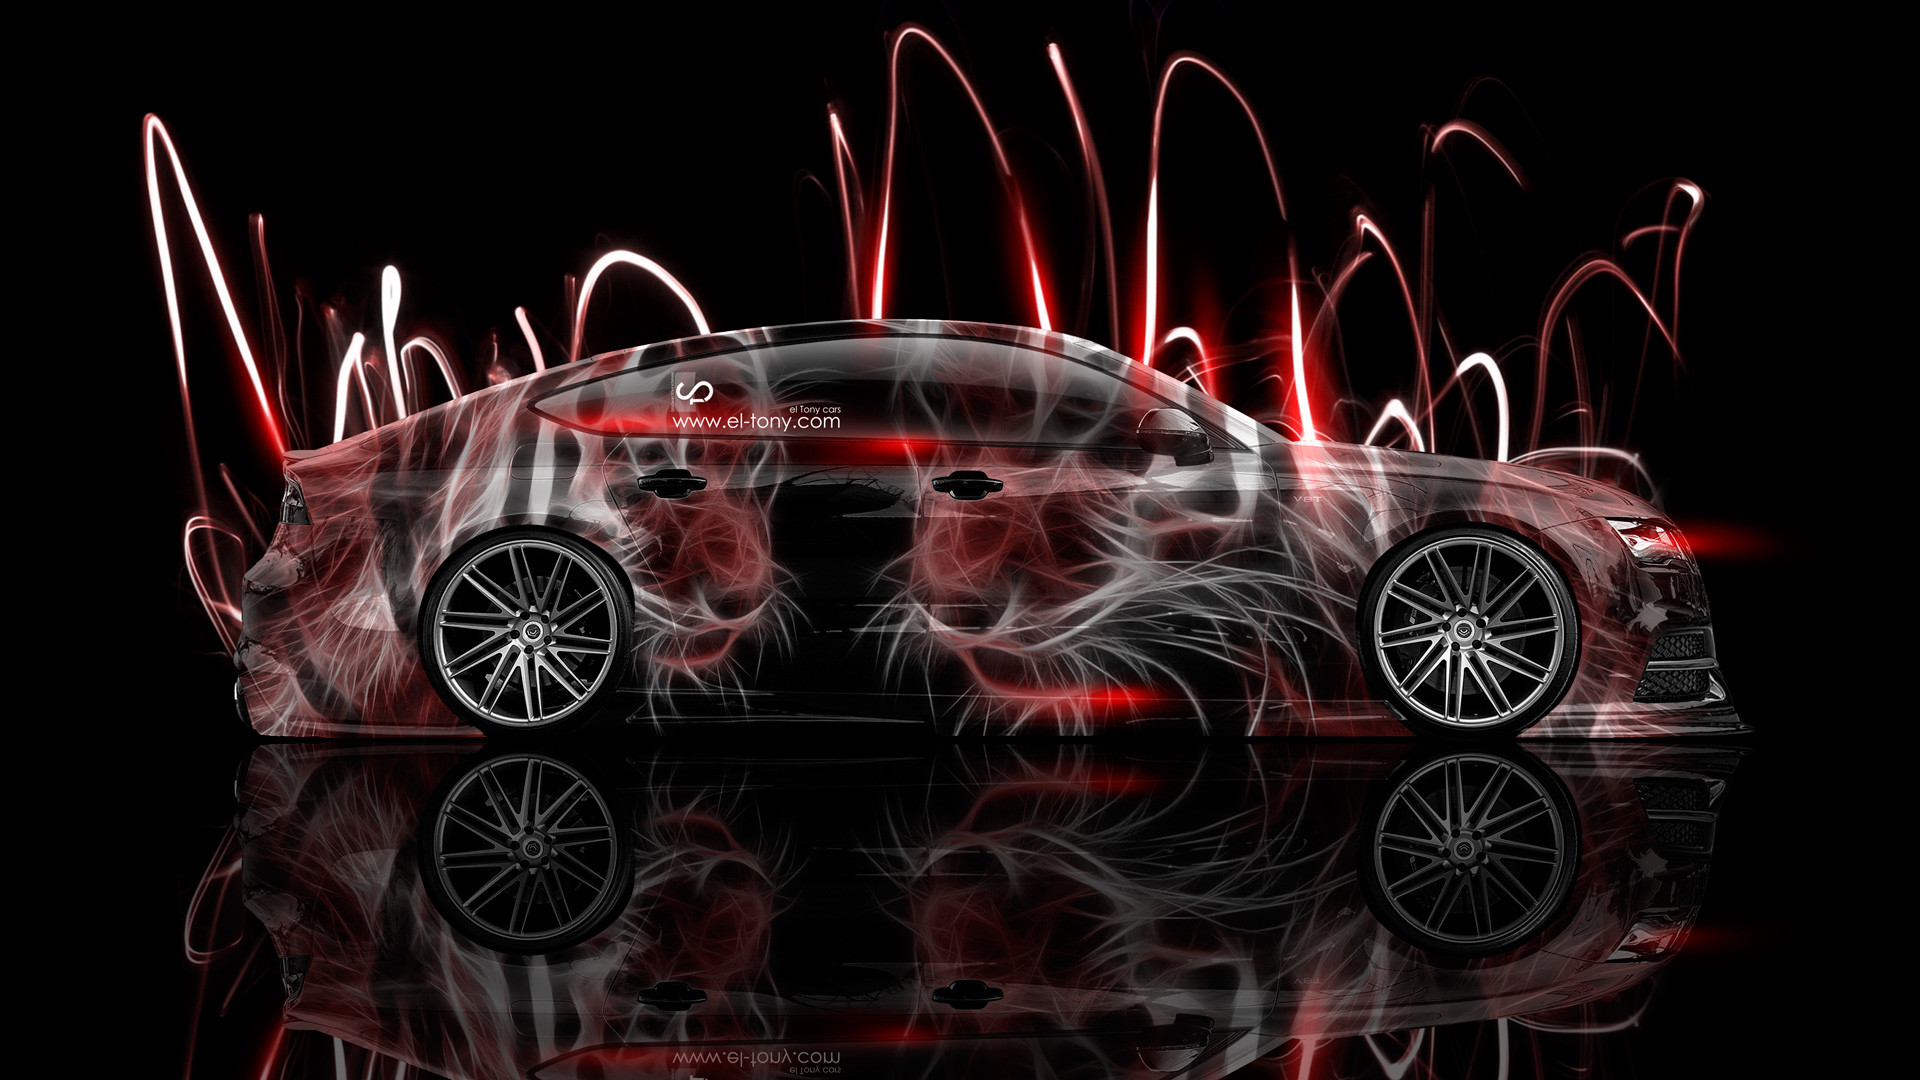 … Audi-S7-Side-Animal-Aerography-Tiger-Abstract-Car- …